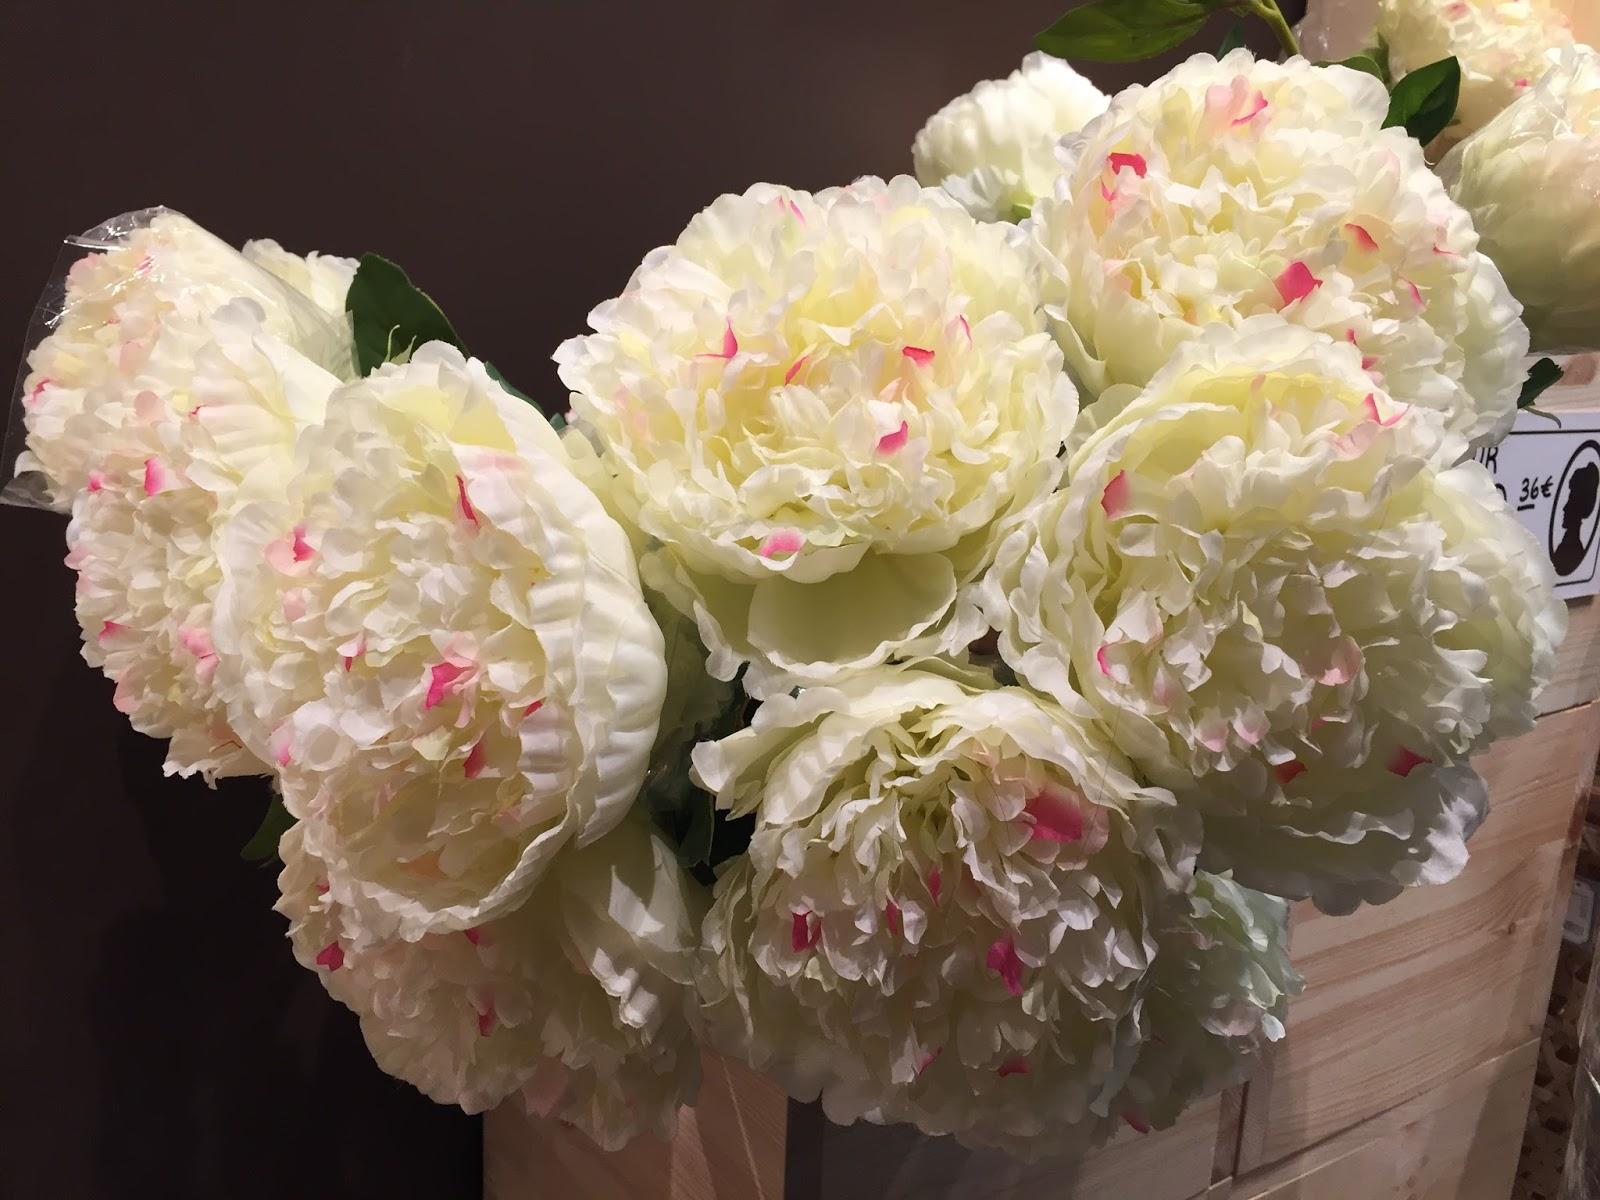 soeurs Sostrene Grene du danemark la défense paris fleur artificielle pivoine